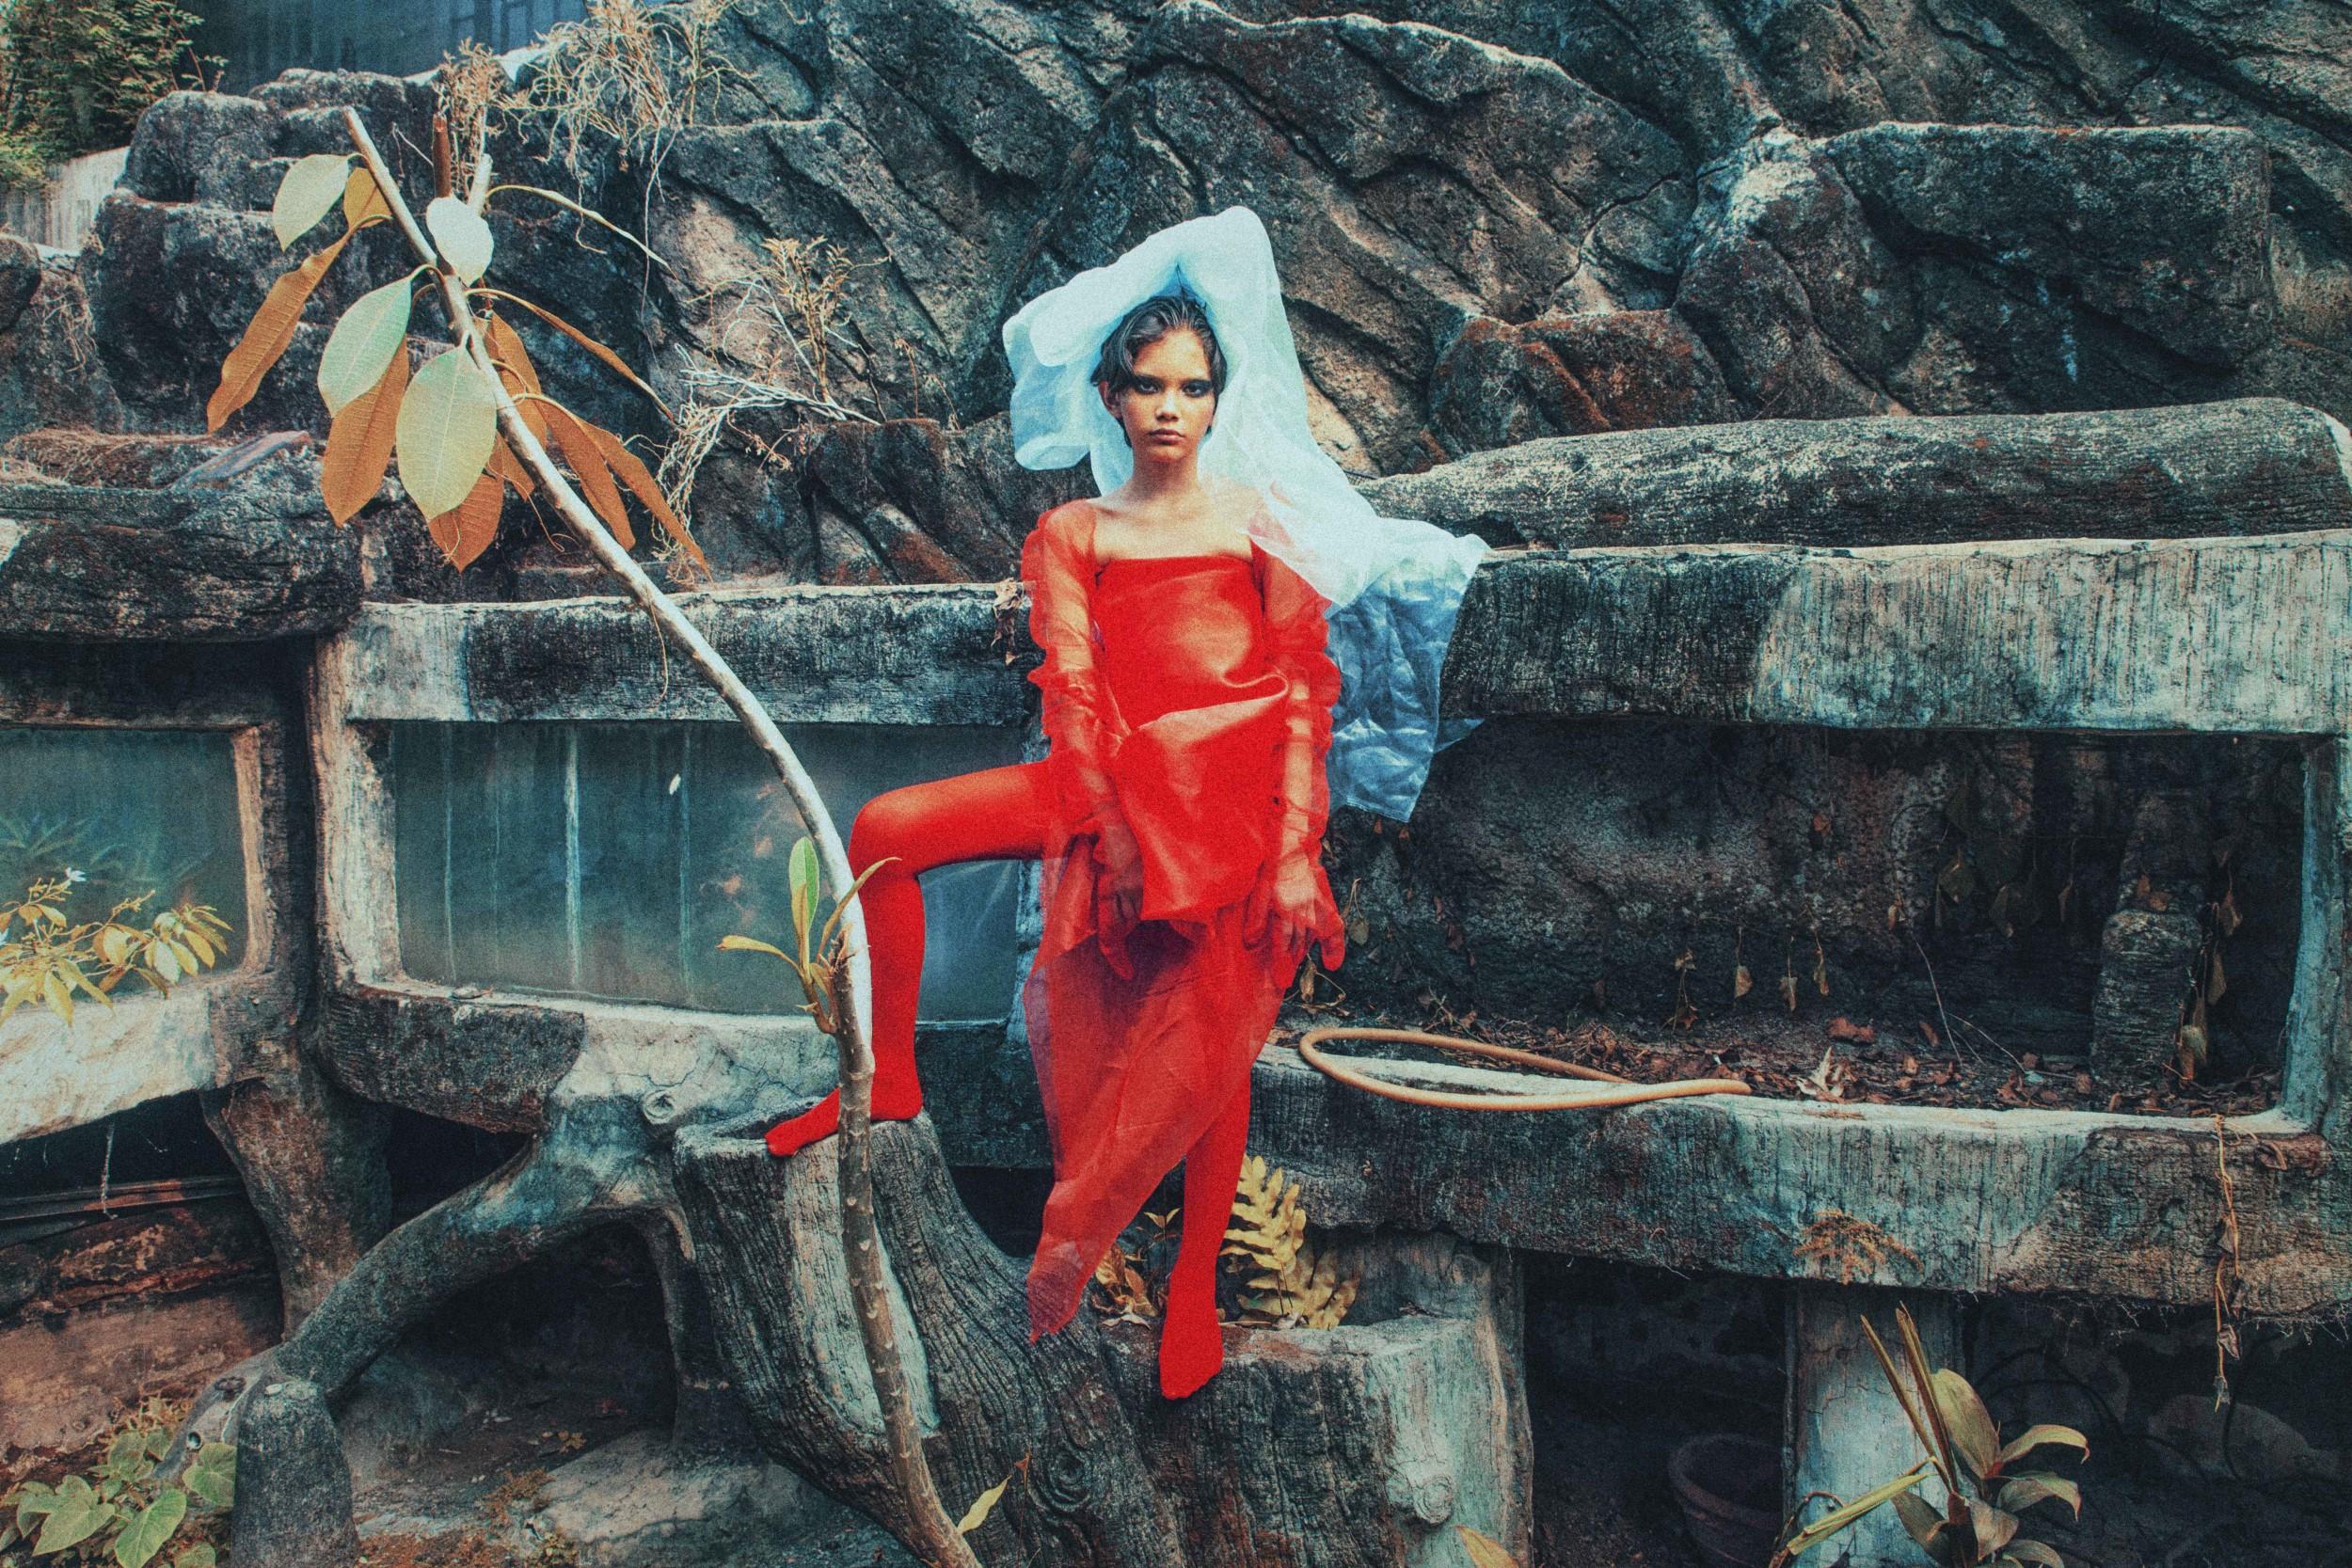 Indonesian Photographer Bintang Adamas 'Shakira' Series for Through the Photographer's Lens, Globetroter Magazine (09).jpg